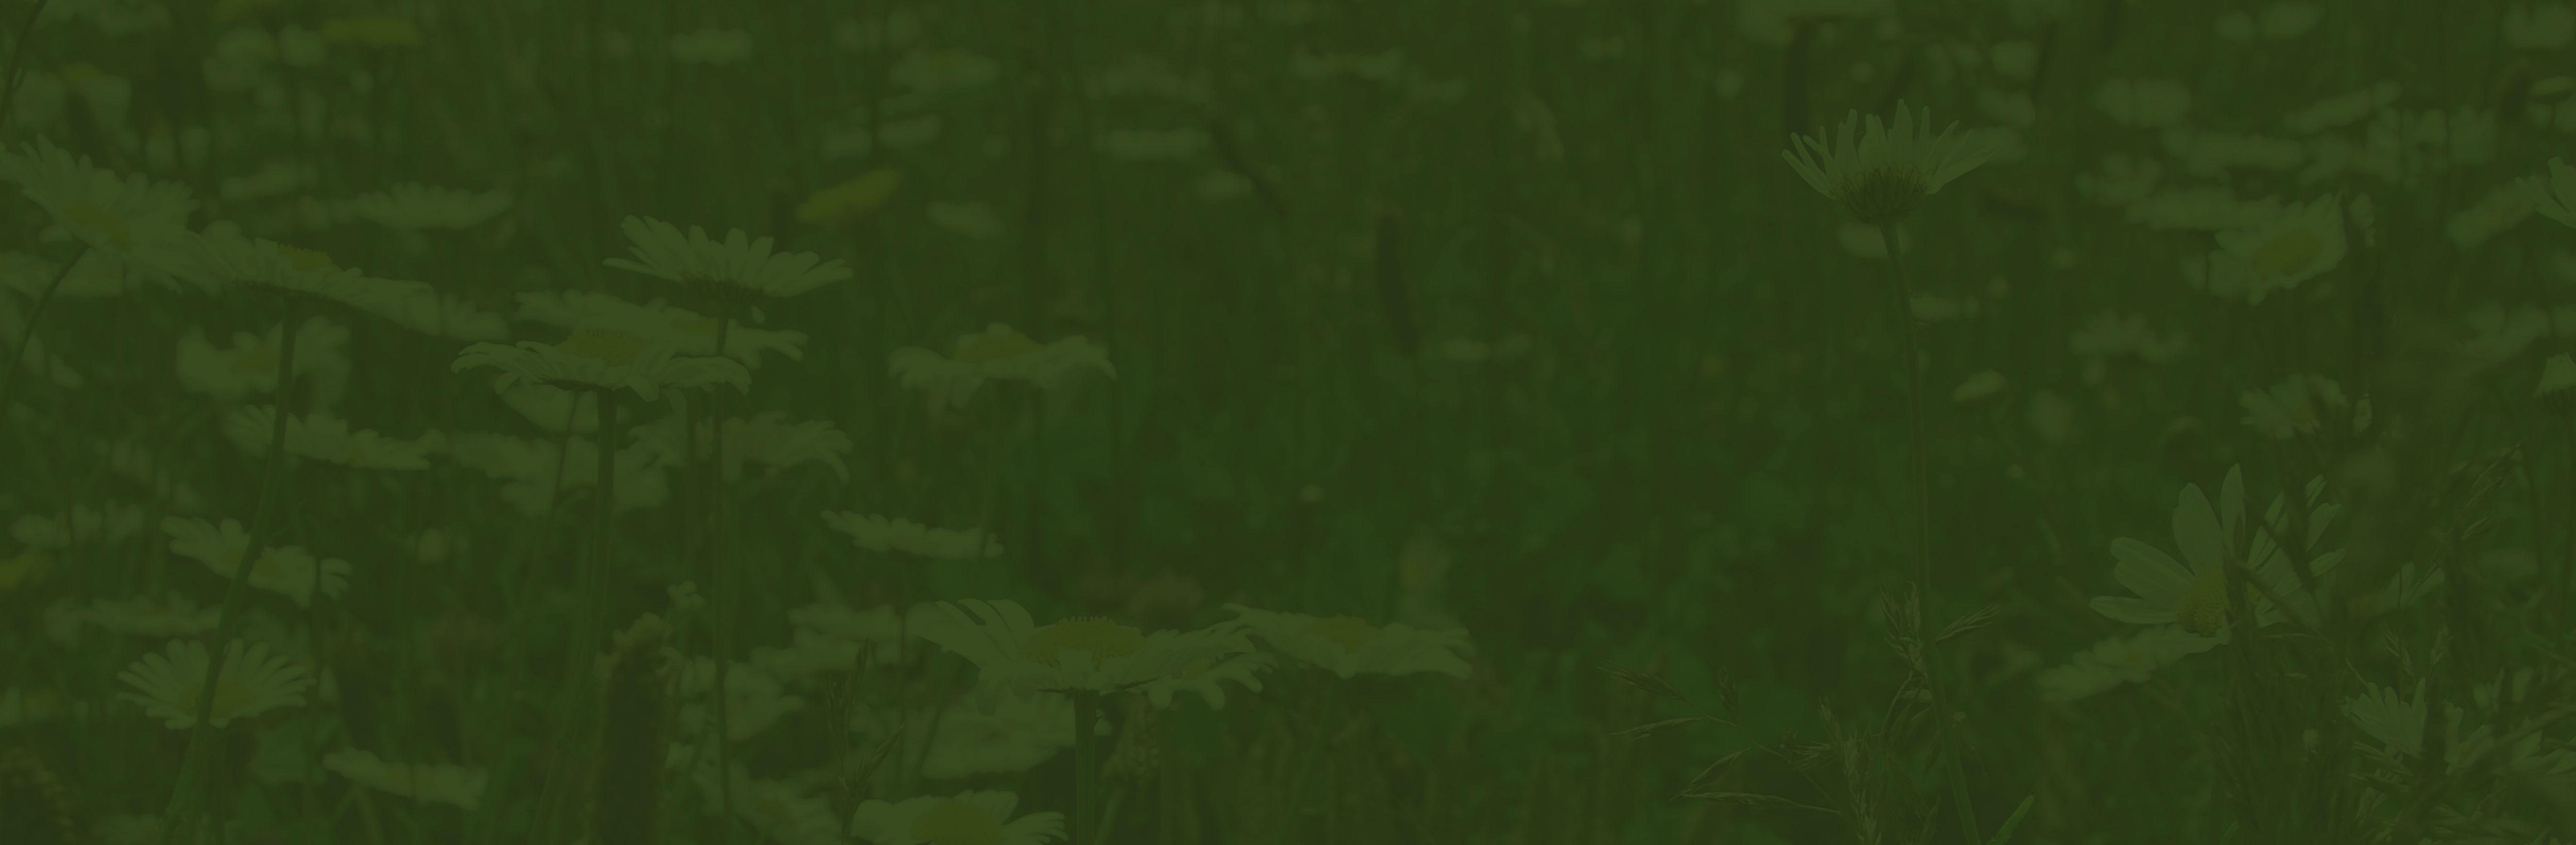 Vegetation Blankets | Sedum-Herbs Blanket | Roof substrates